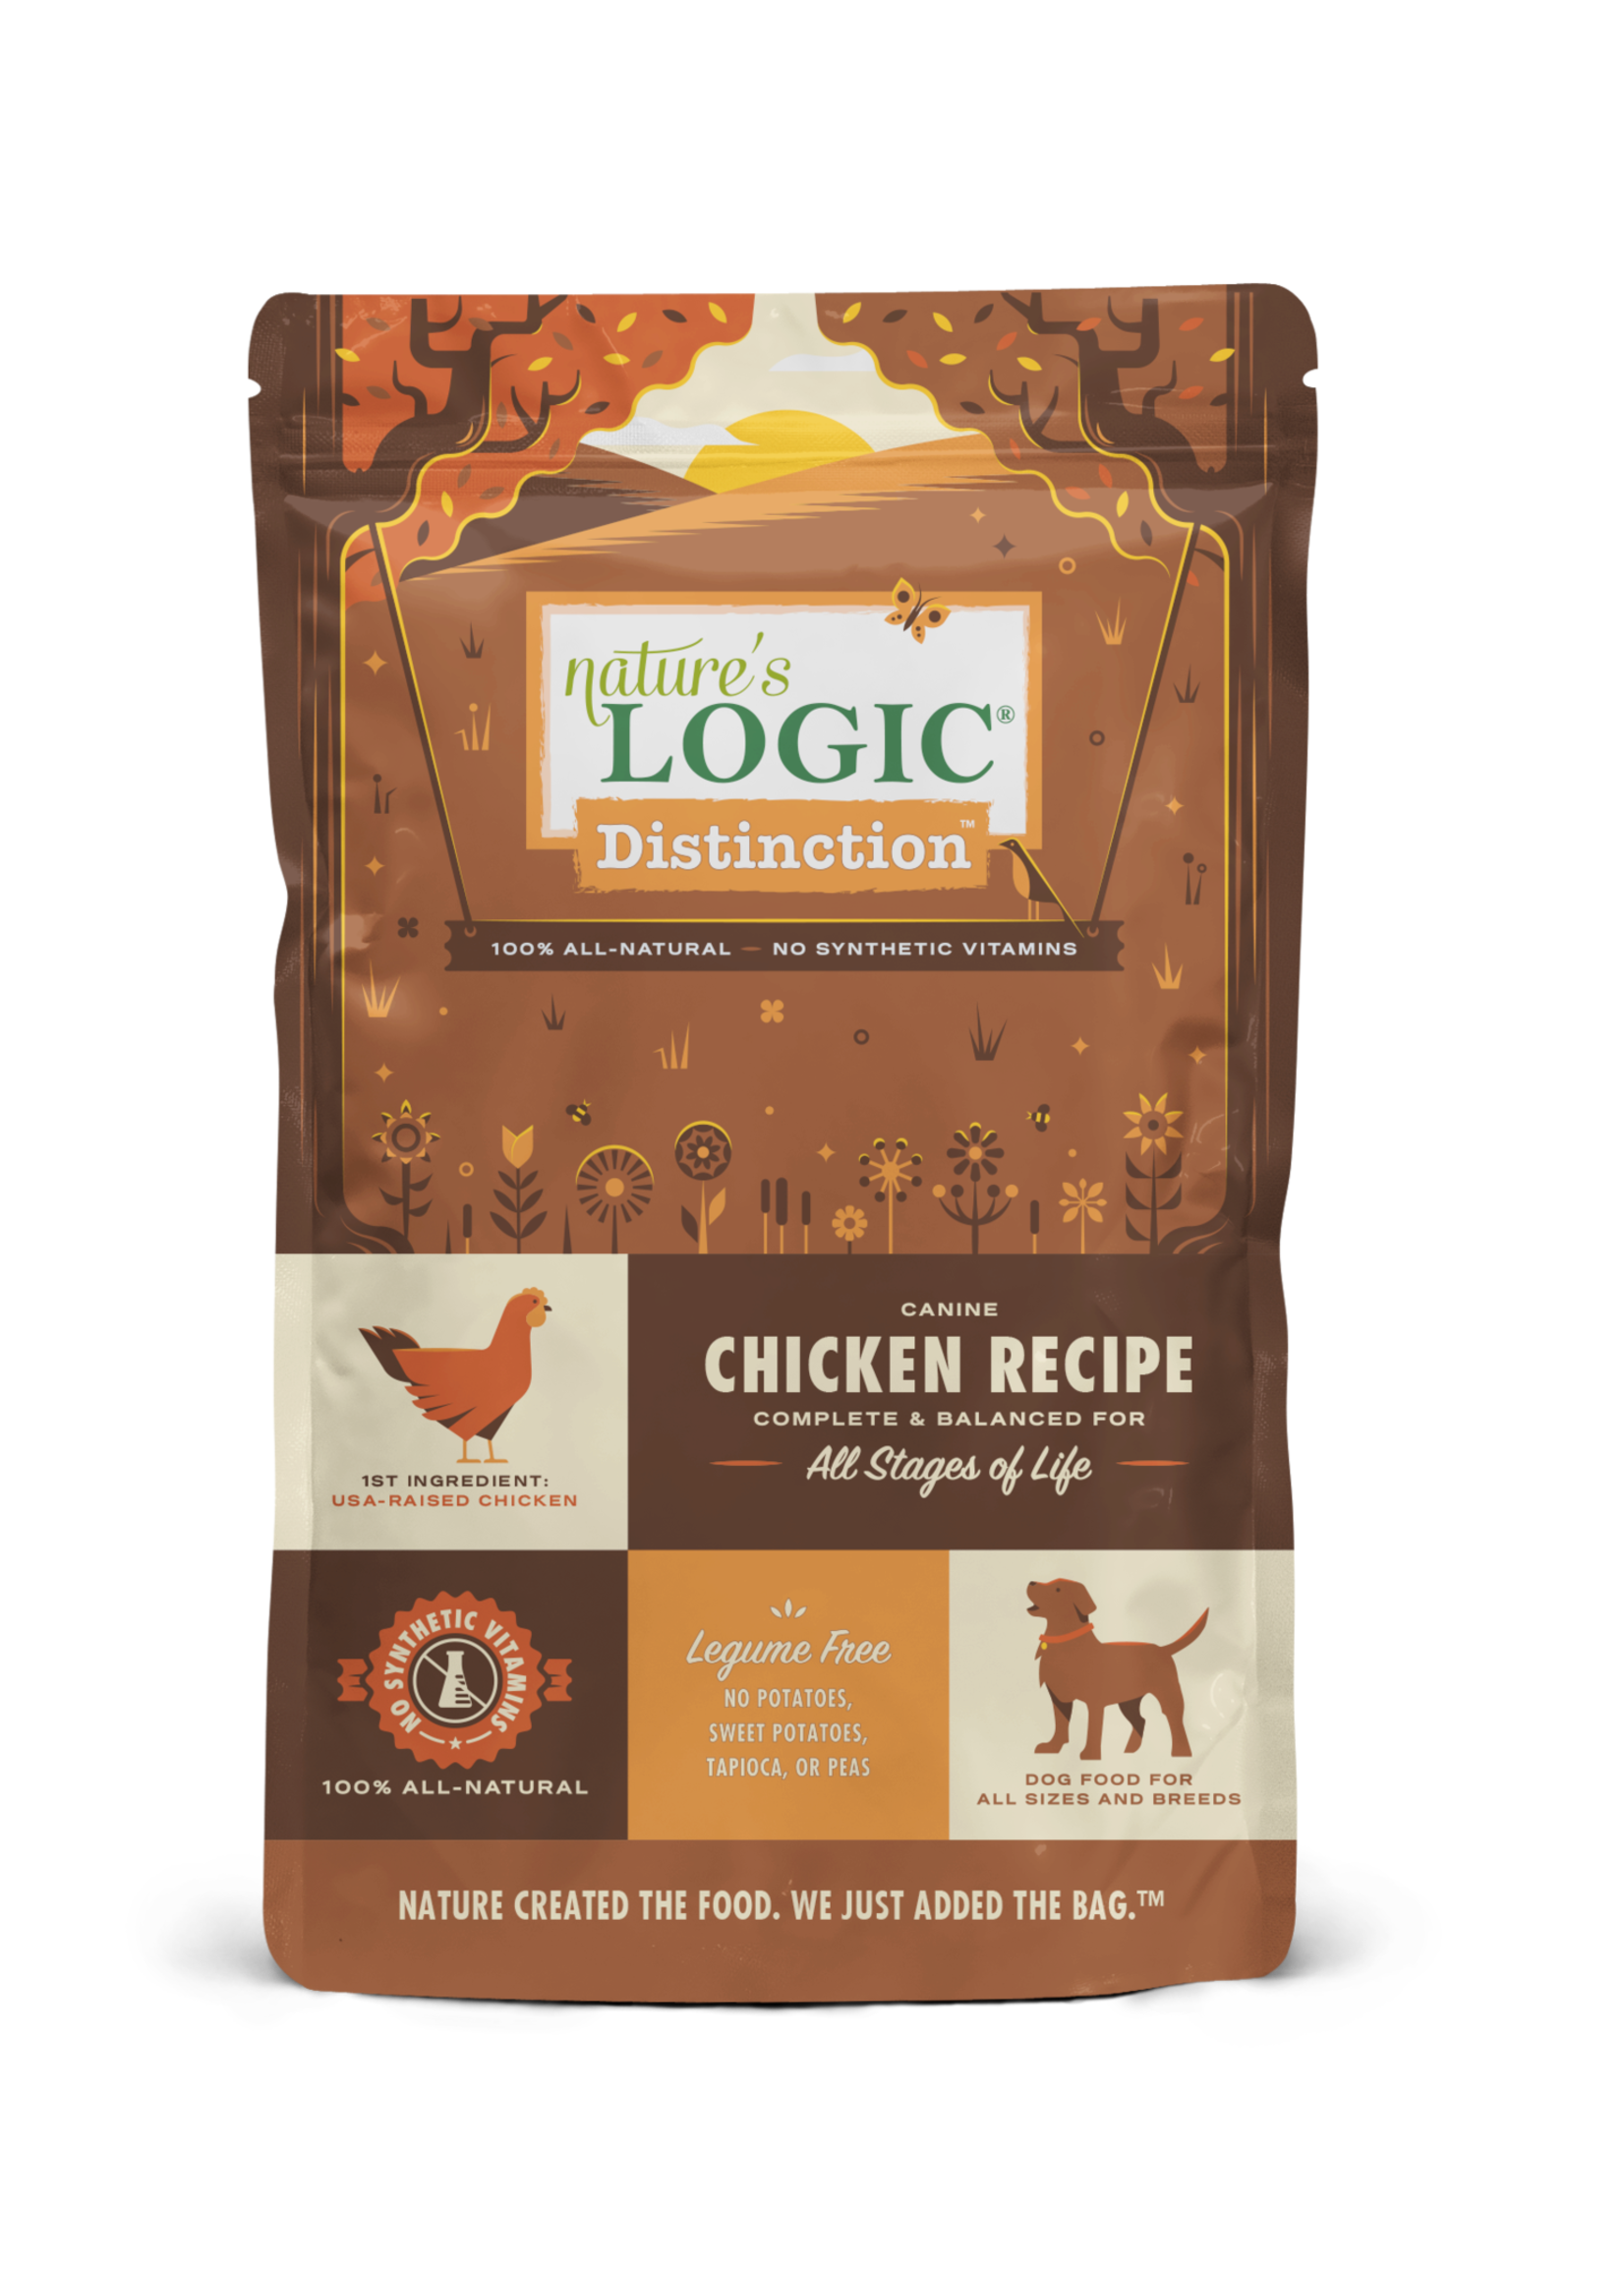 Nature's Logic Nature's Logic Distinction Chicken Dry Dog Food 4.4lbs